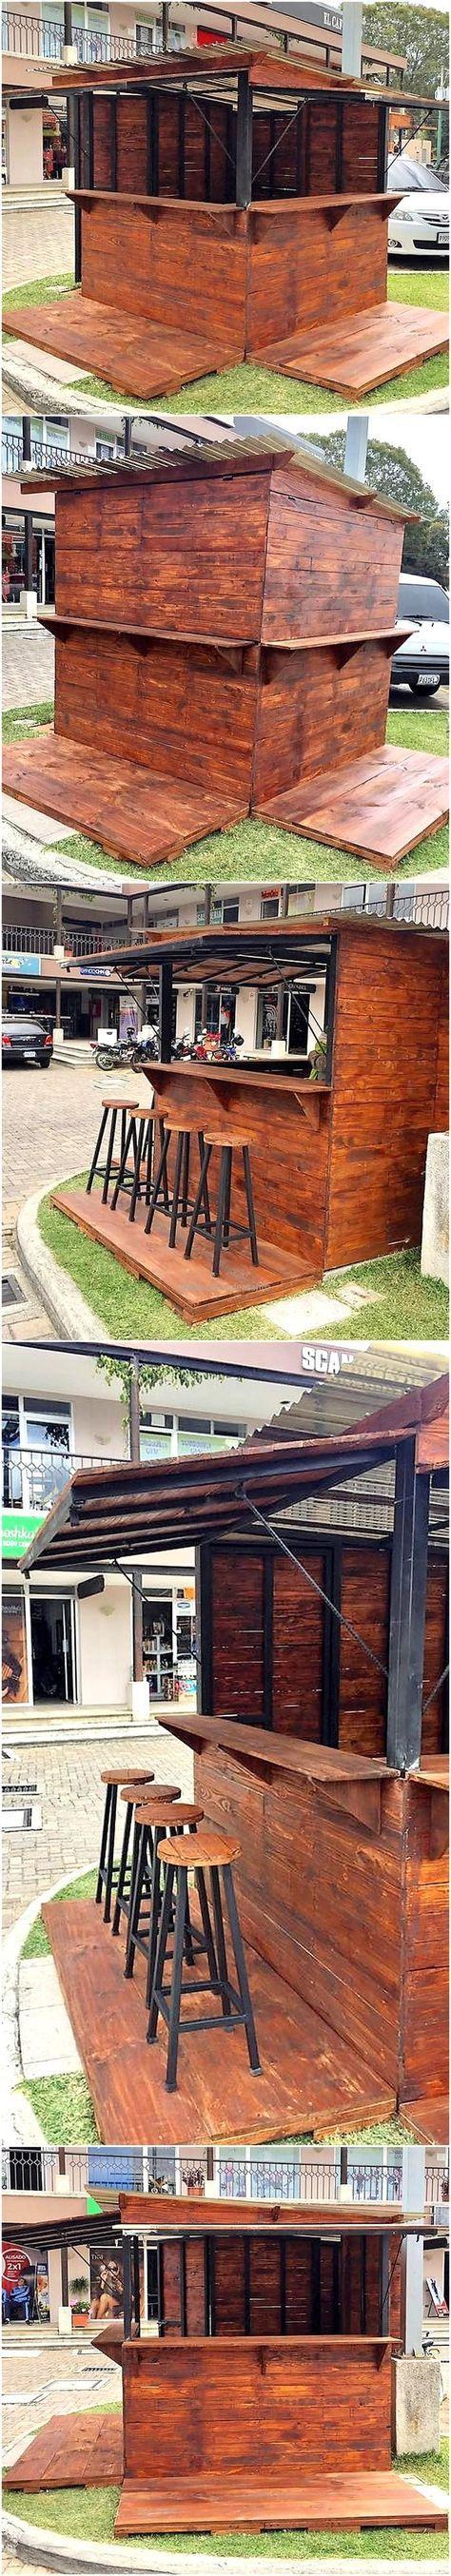 Reclaimed Wood Pallets Patio Bar Plan